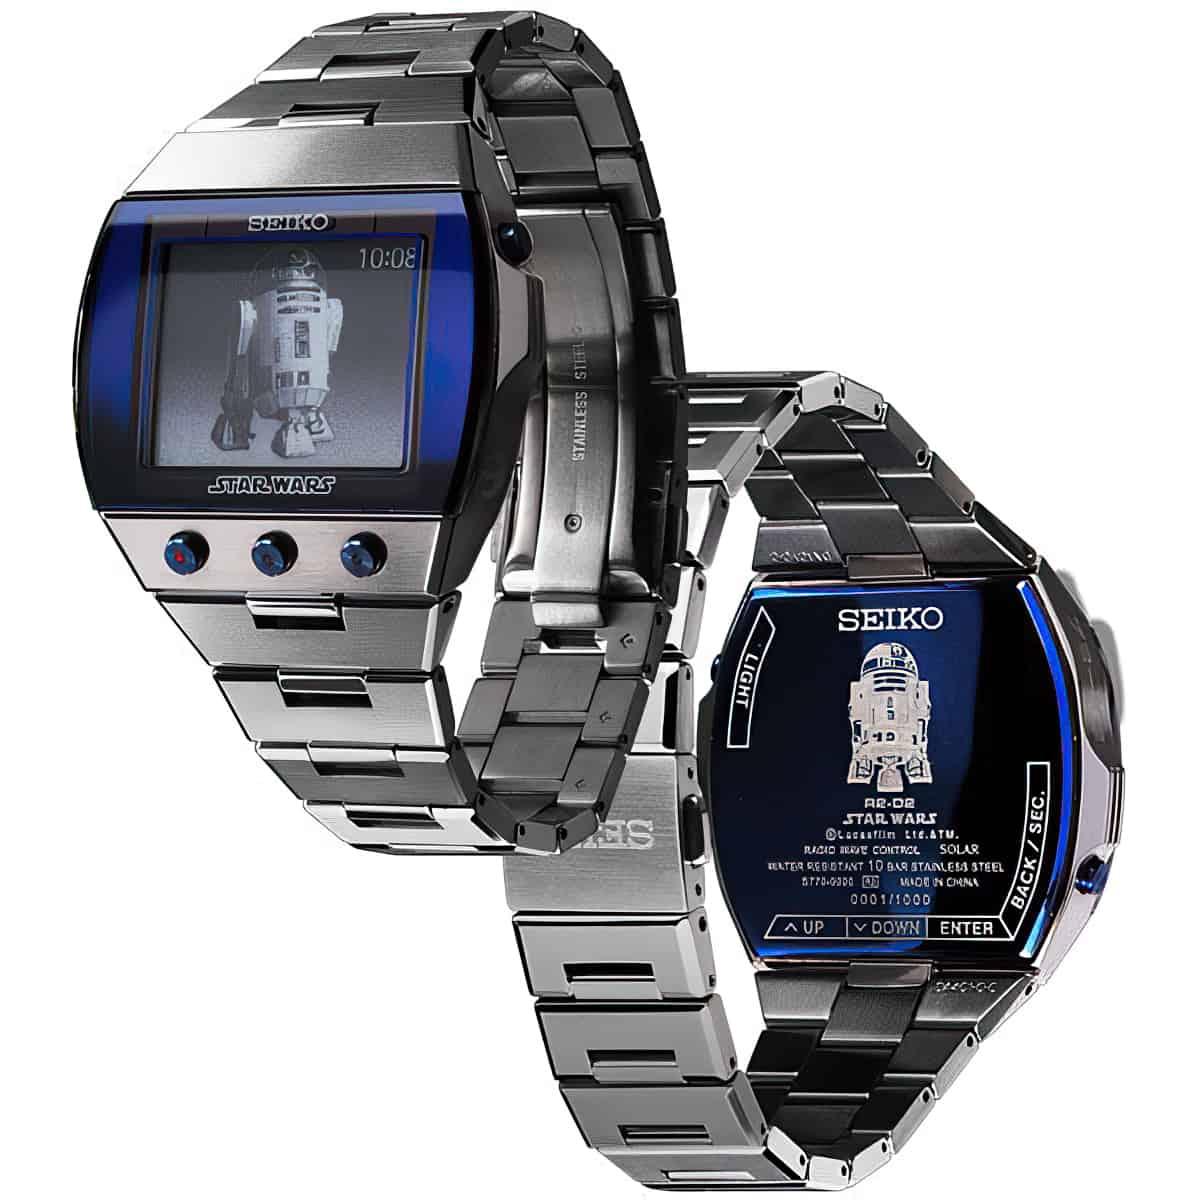 seiko R2 D2 watch